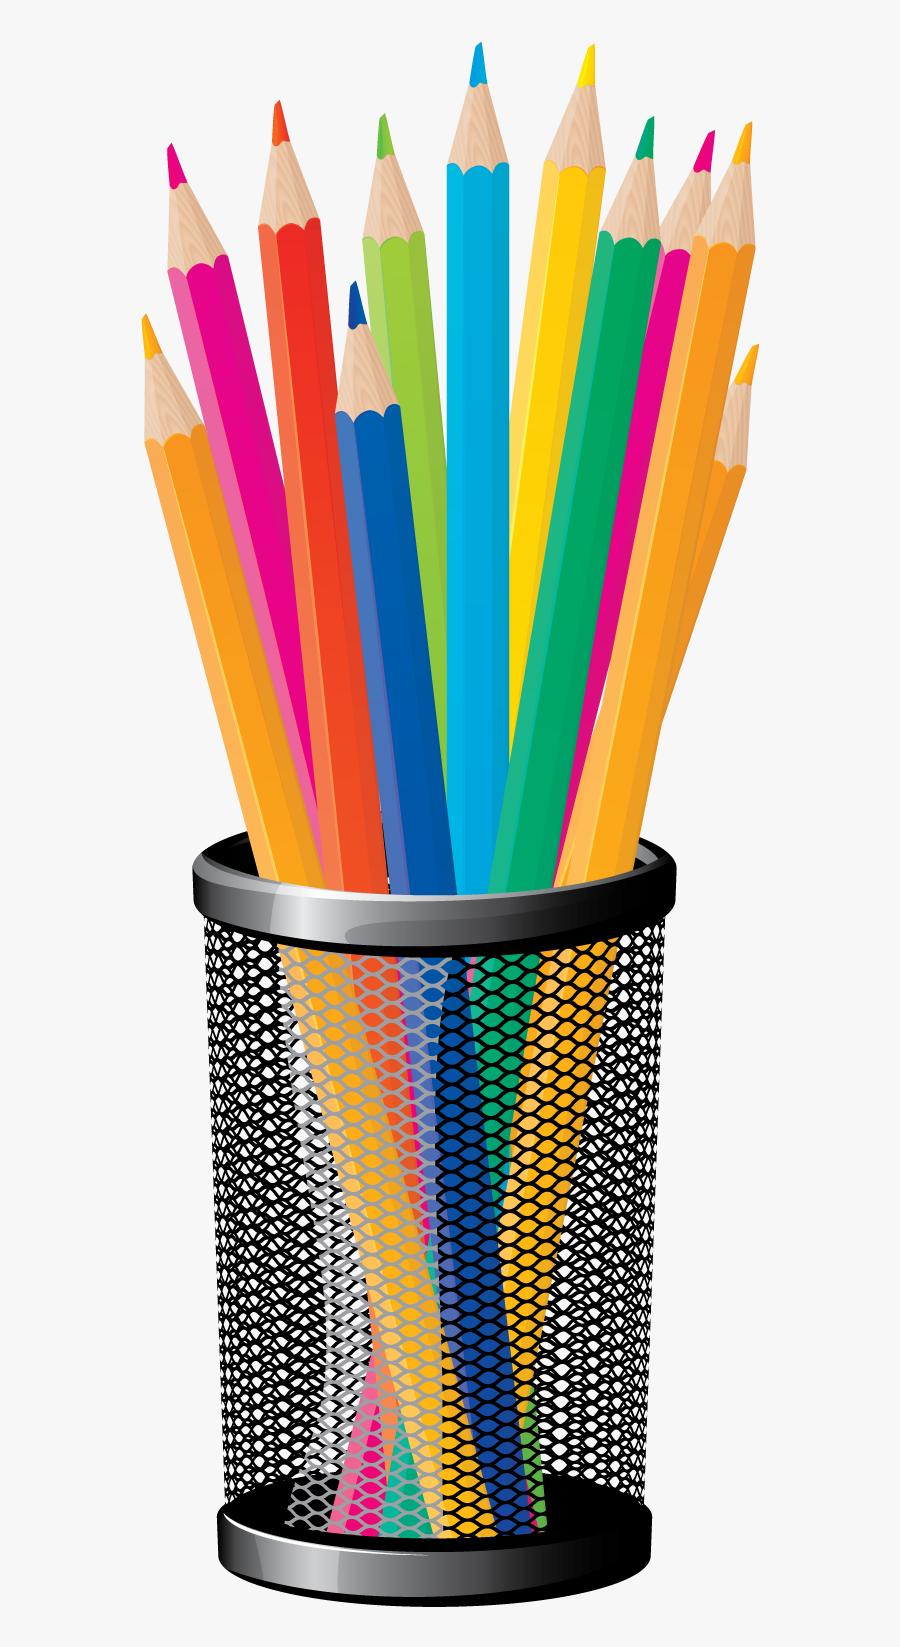 Clip Art Pencil Cup Png Clipart - School Supplies Transparent Background, Transparent Clipart